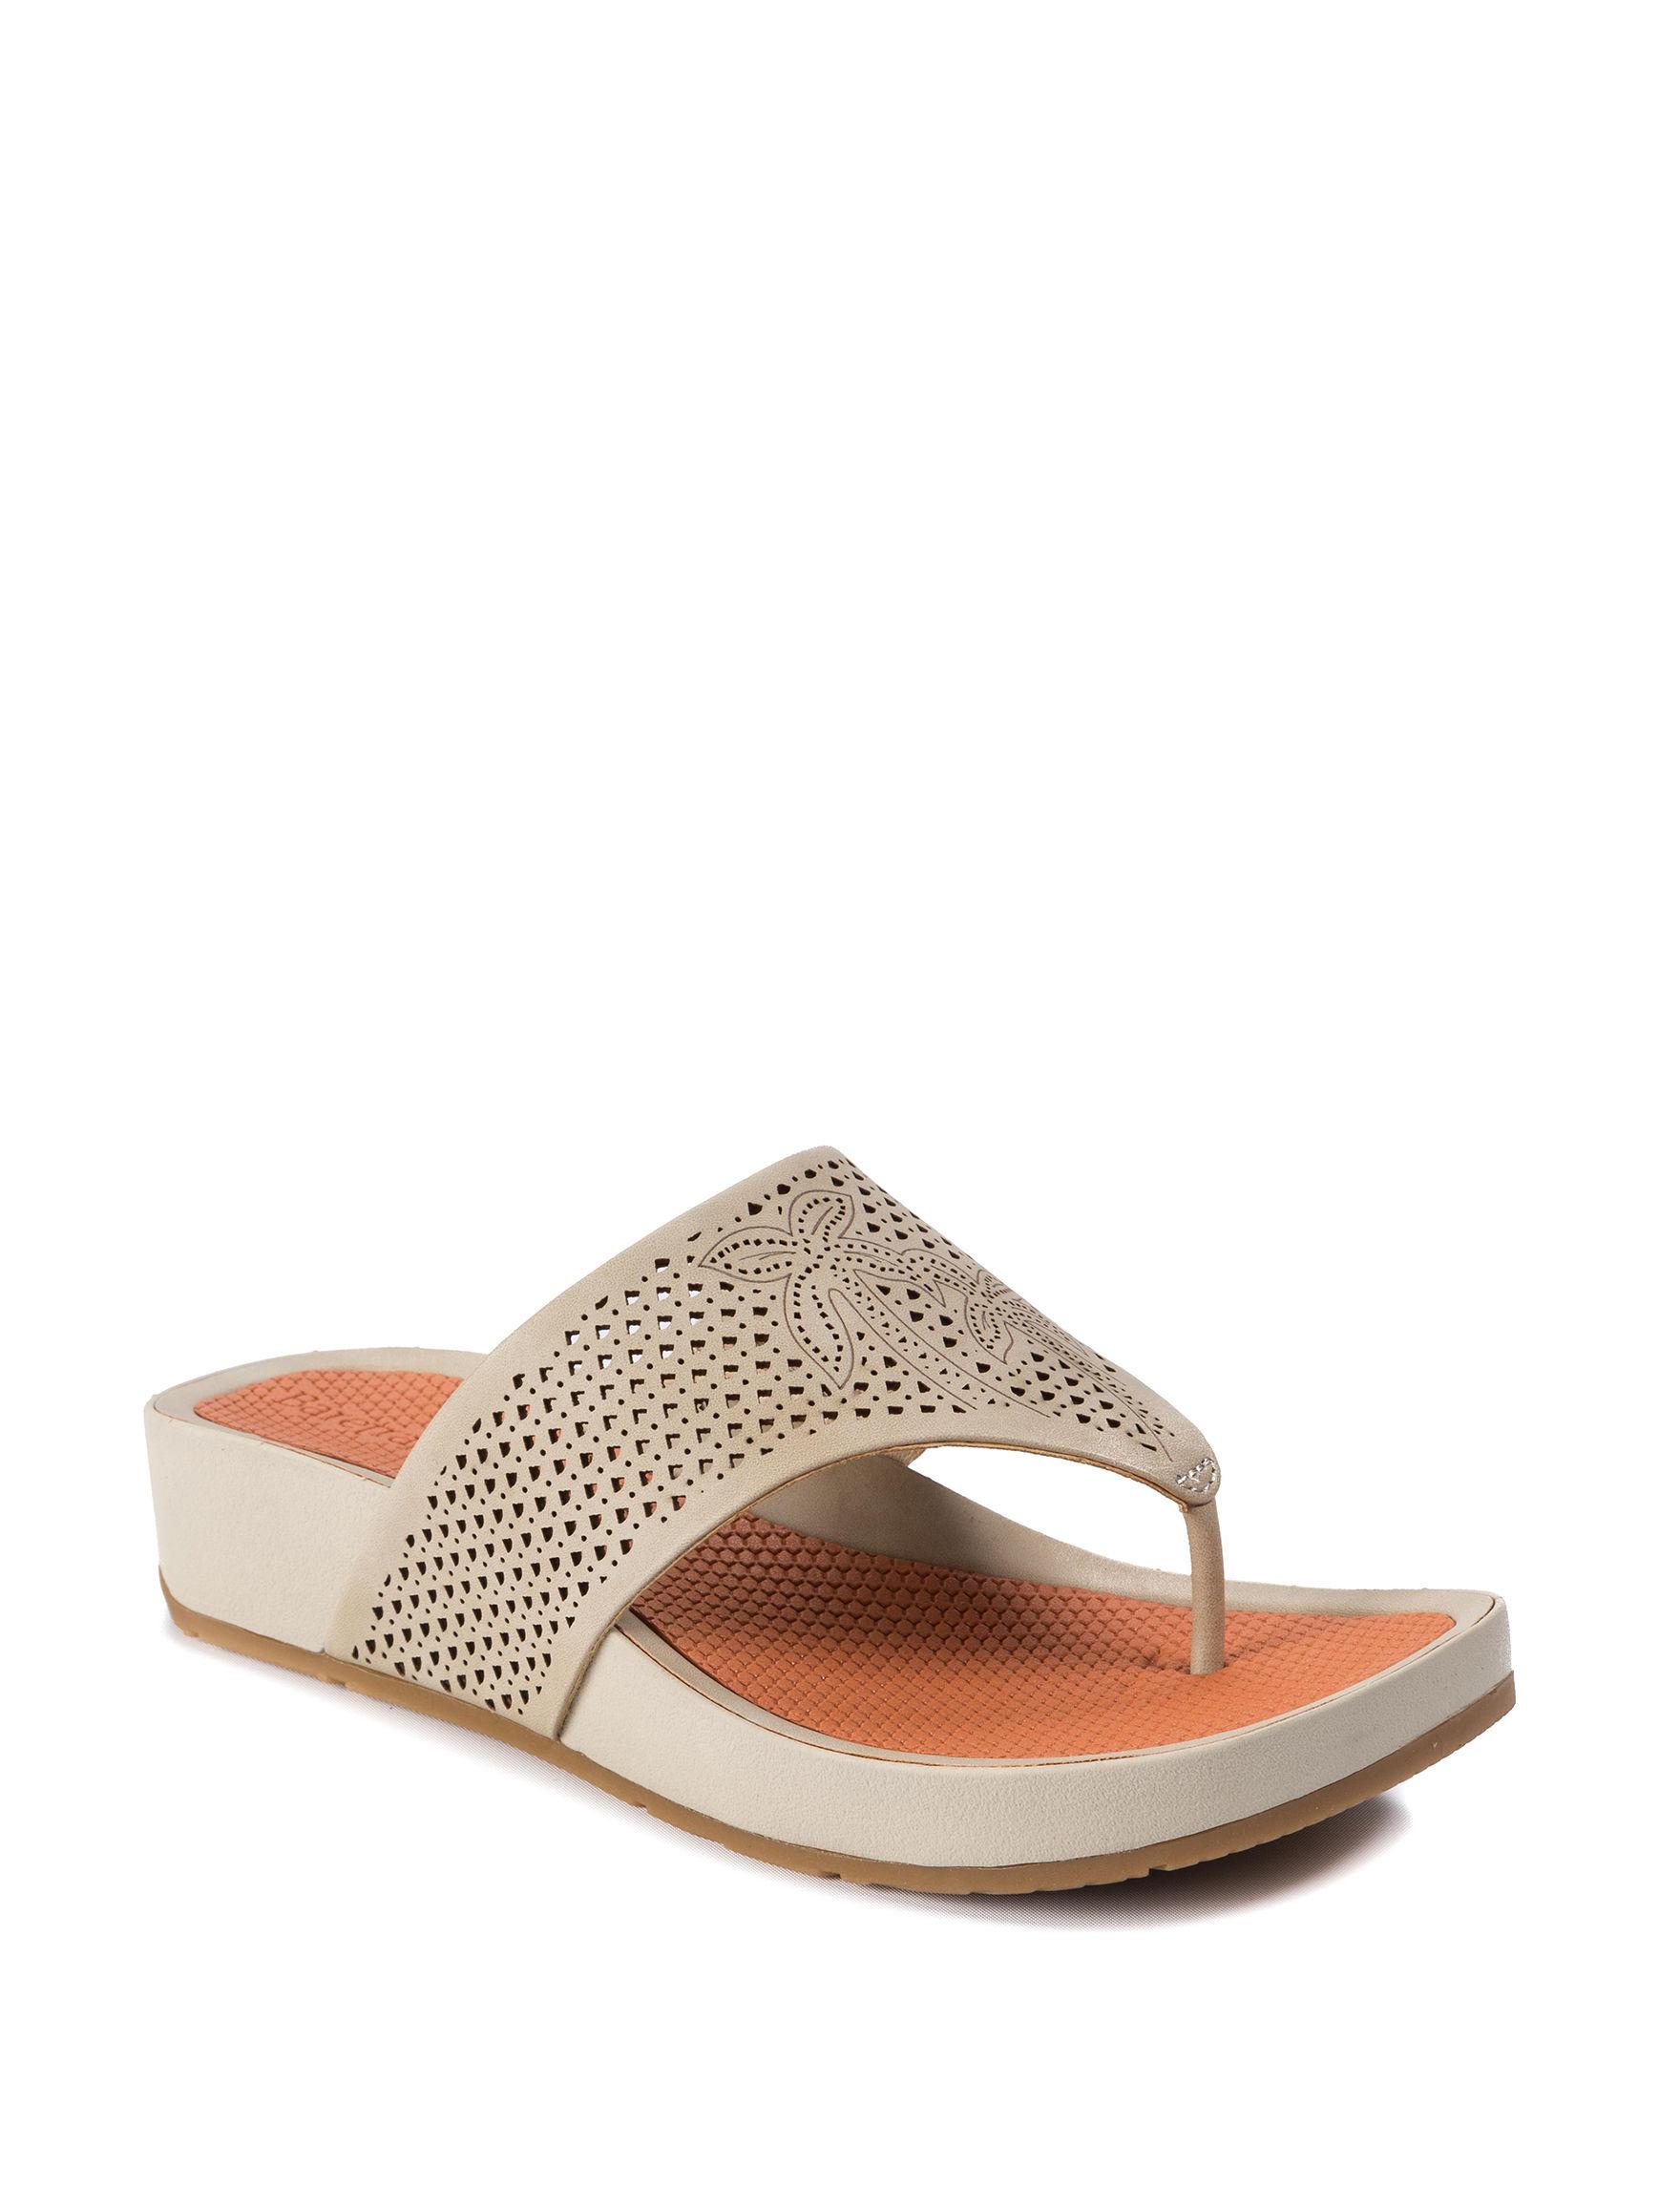 Baretraps Stone Flat Sandals Wedge Sandals